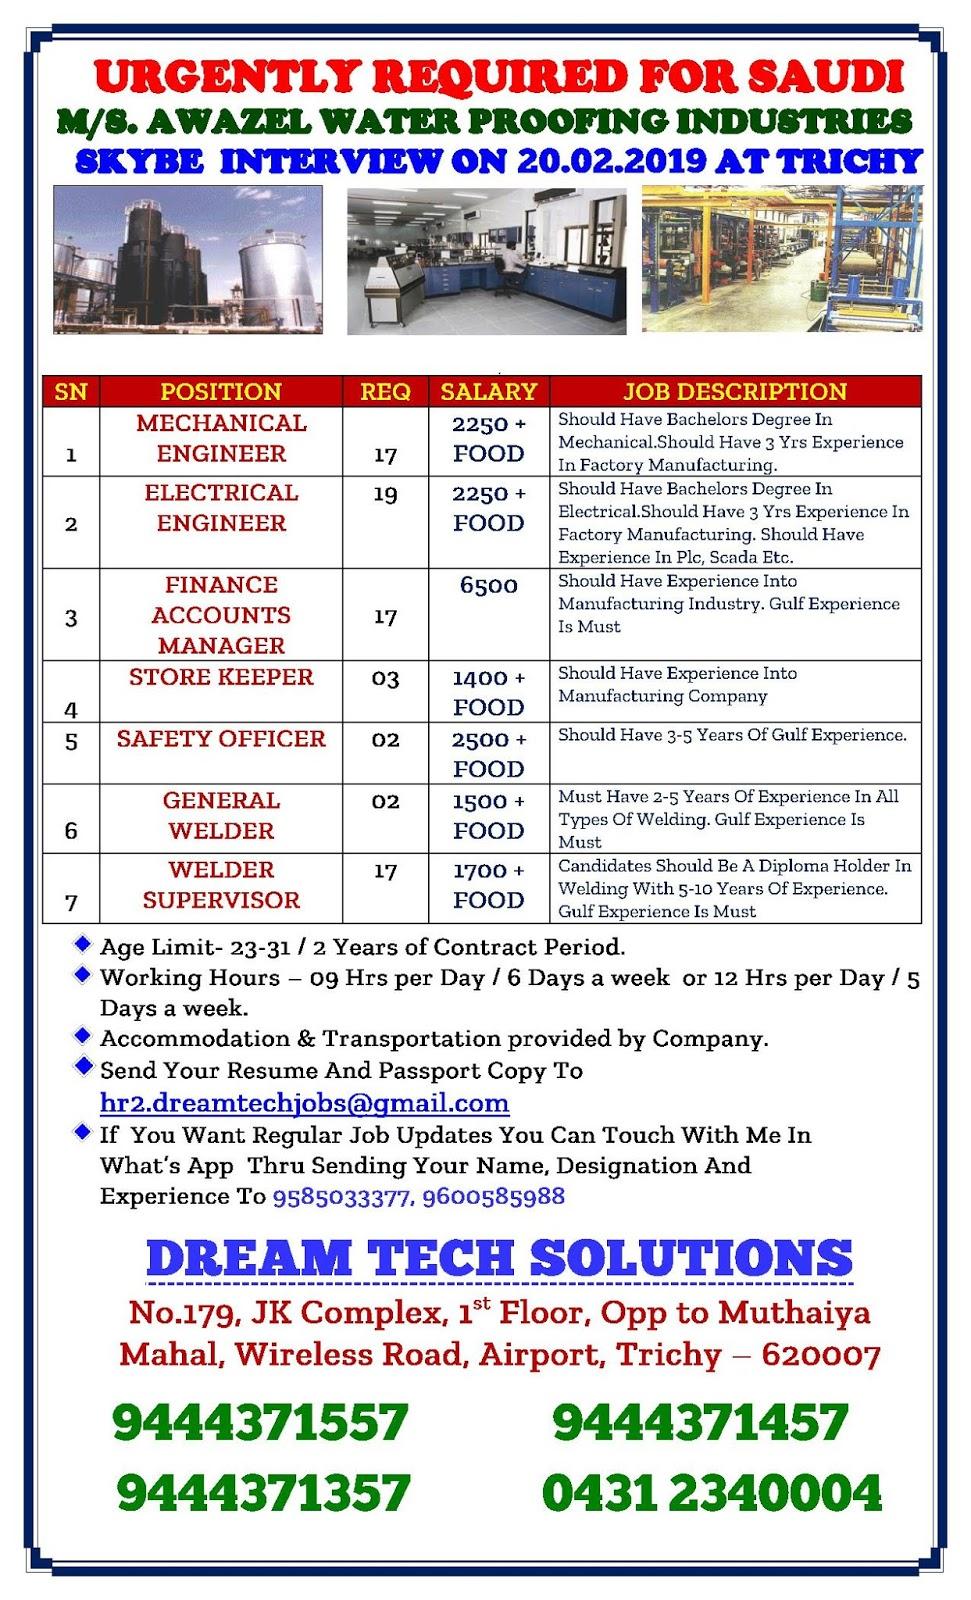 Dream Tech Solutions